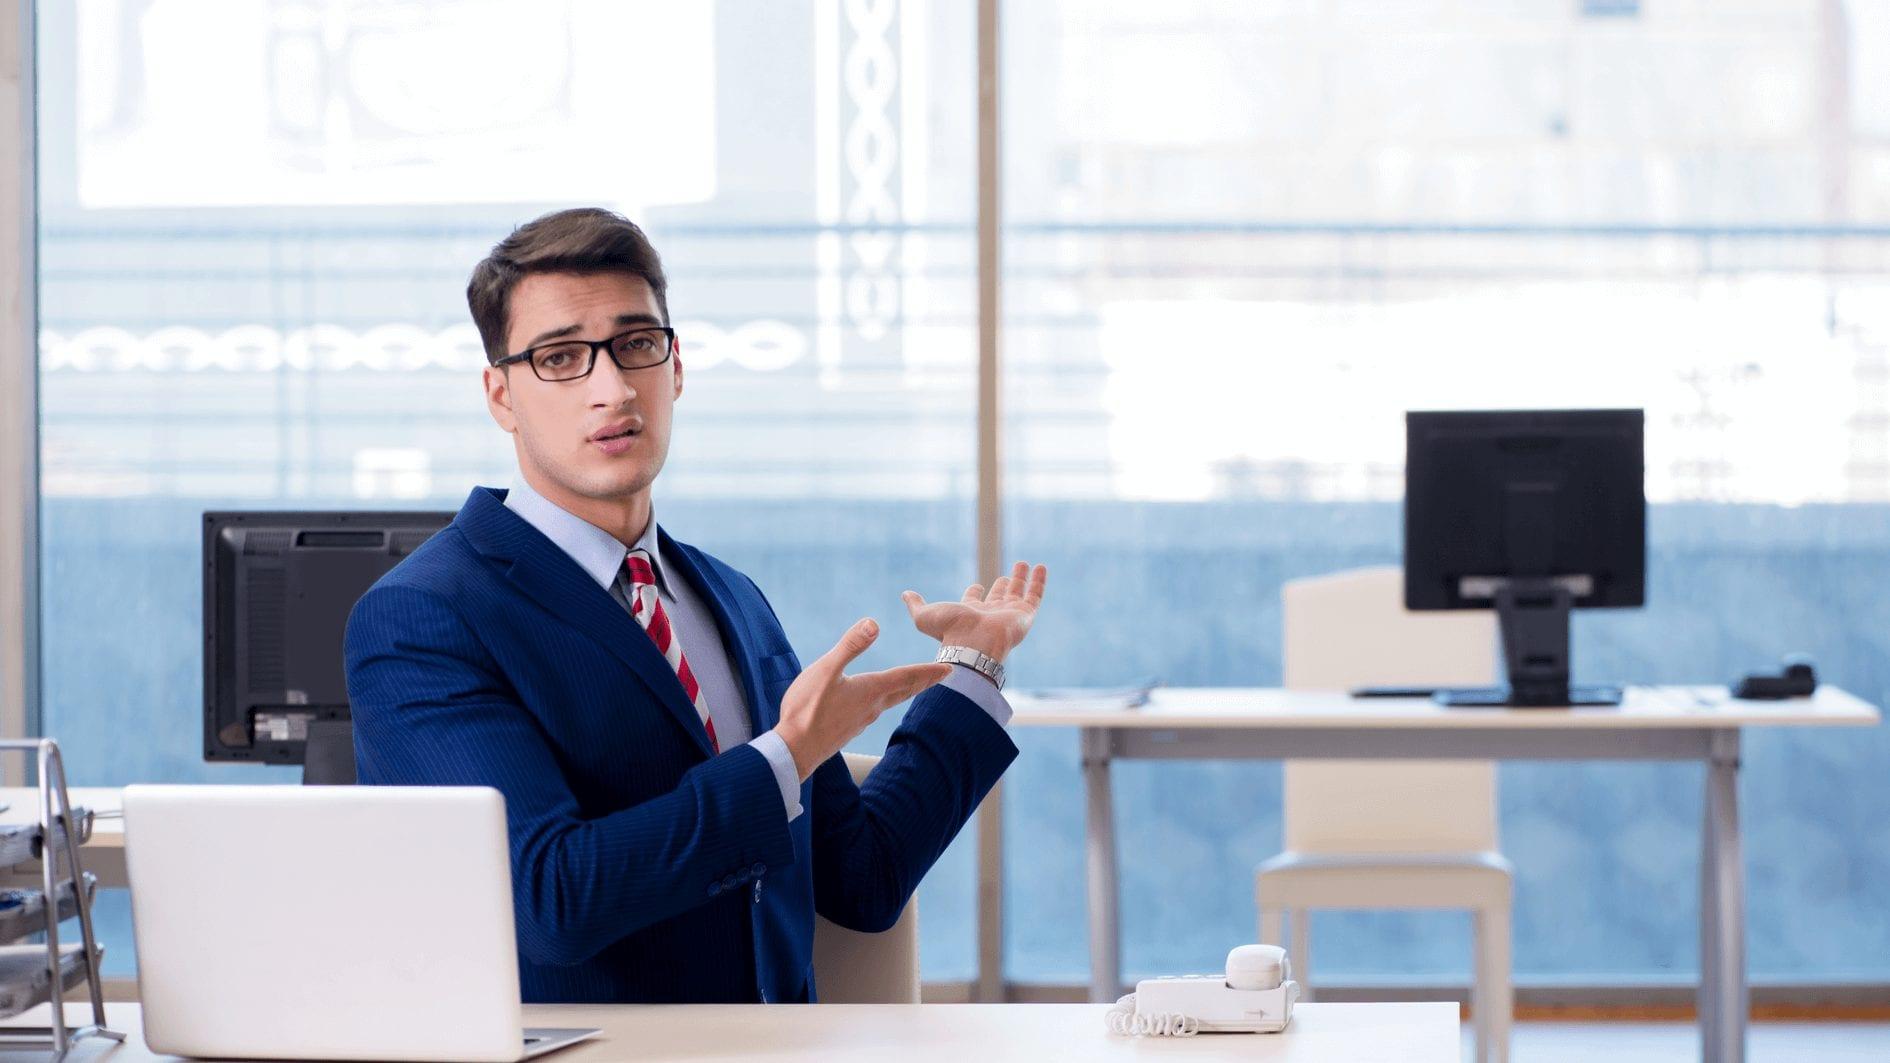 Apa Itu CEO? Bagaimana Tugas CEO Sebuah Perusahaan?